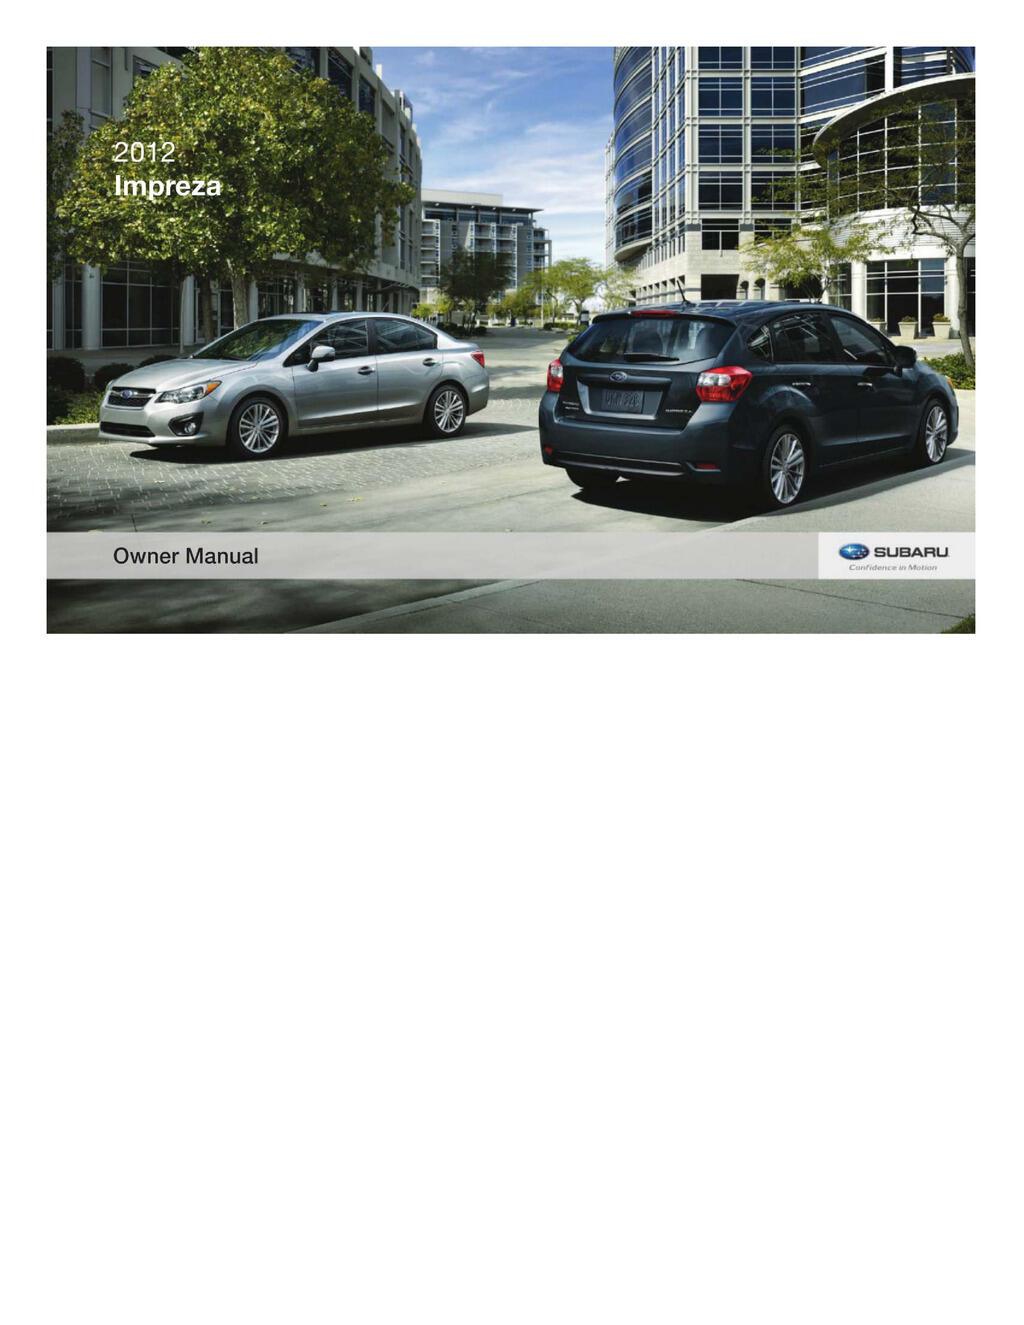 2012 Subaru Impreza owners manual